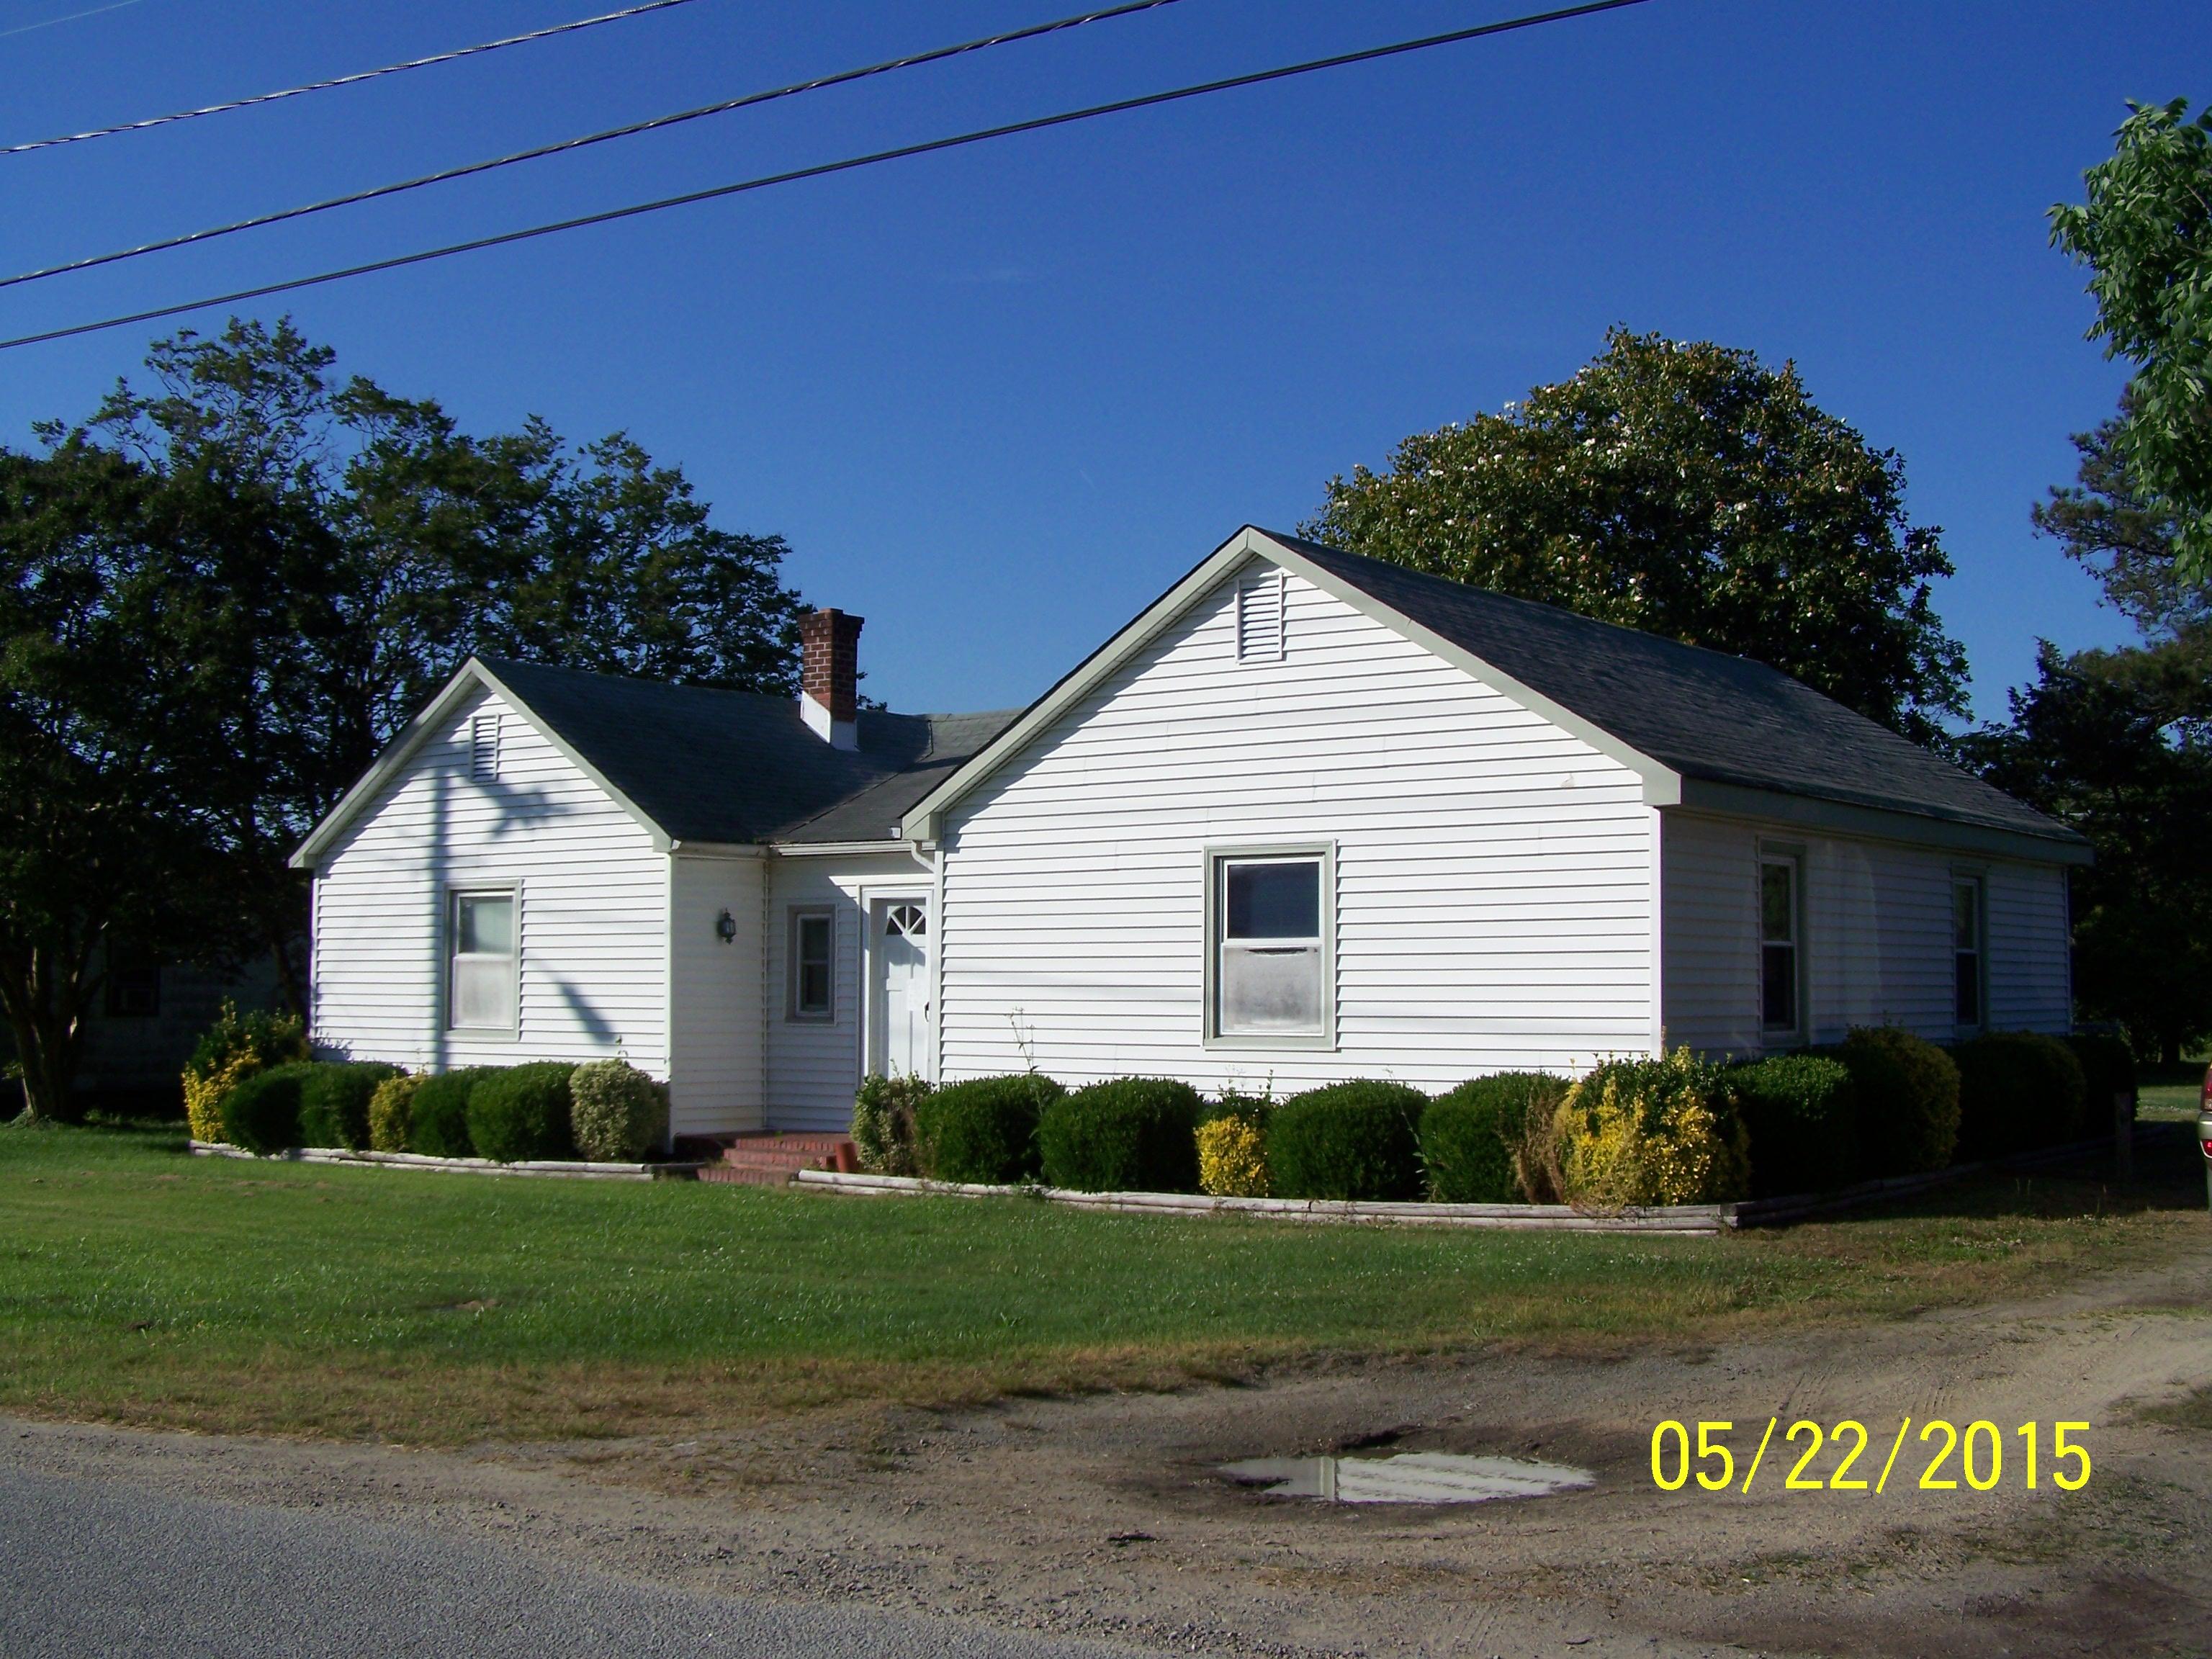 6059 Old Carrsville Road, Carrsville, Virginia 23315